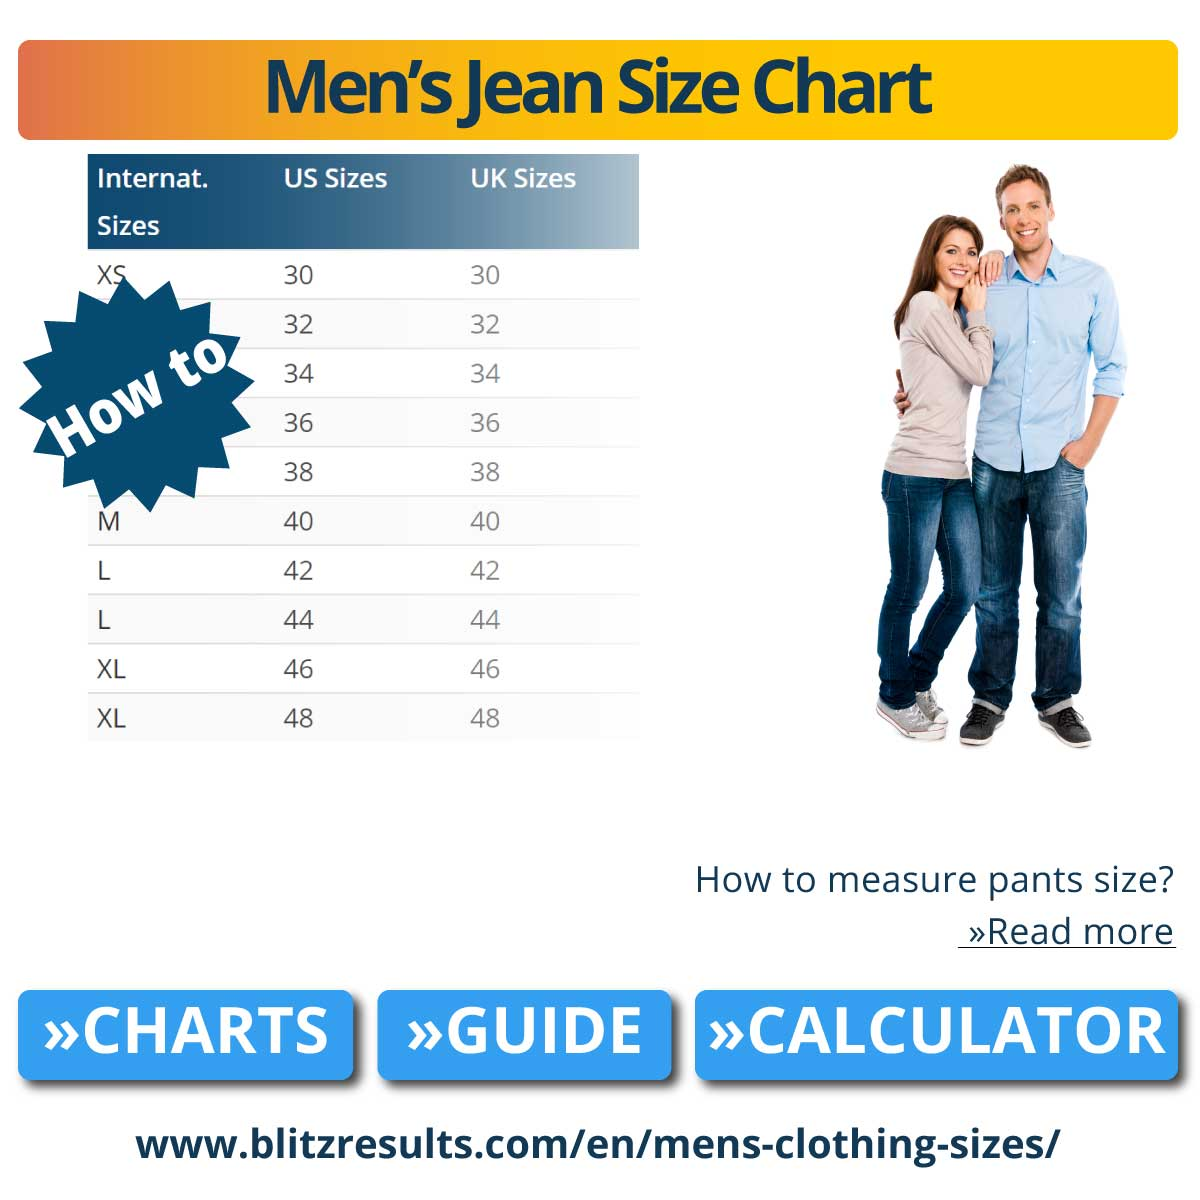 Men's Jean Size Chart